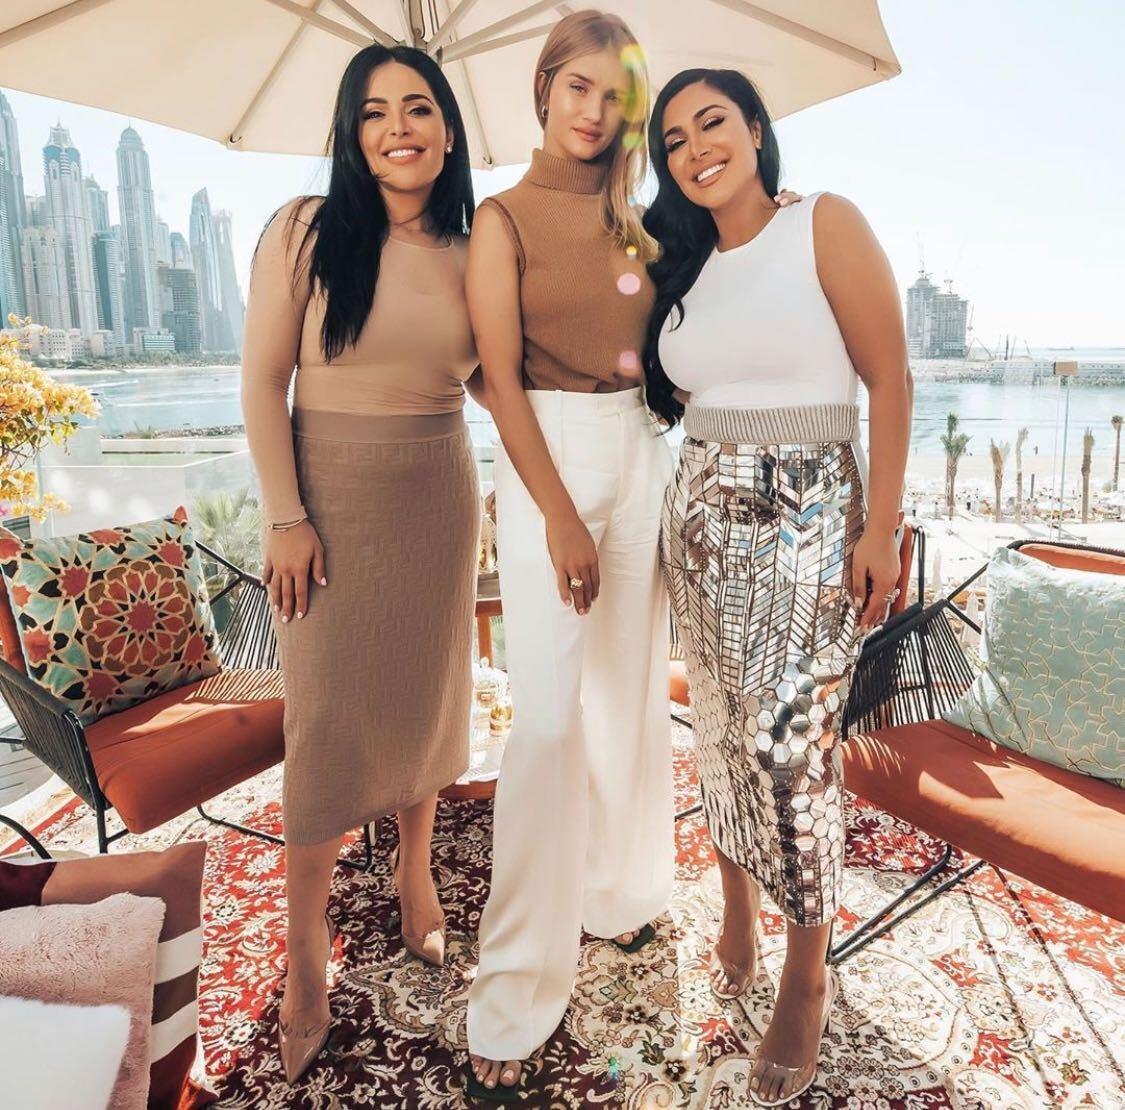 Huda and Mona Kattan Share Their Story On Rosie Huntington-Whiteley's New Series